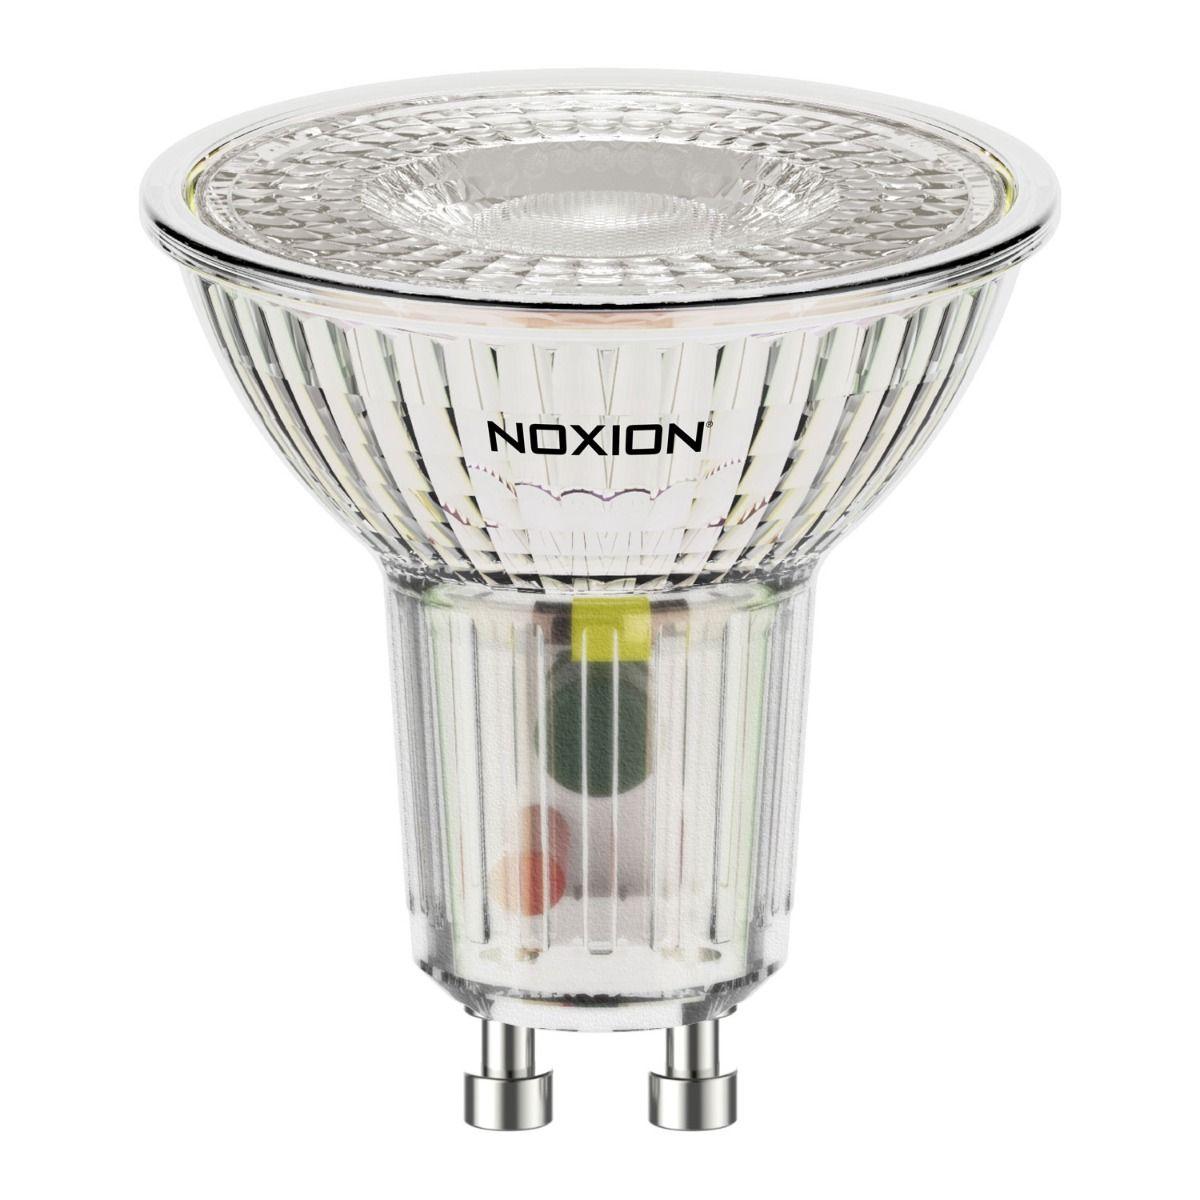 Noxion LED Spot GU10 3.7W 830 36D 260lm | Vervanger voor 35W